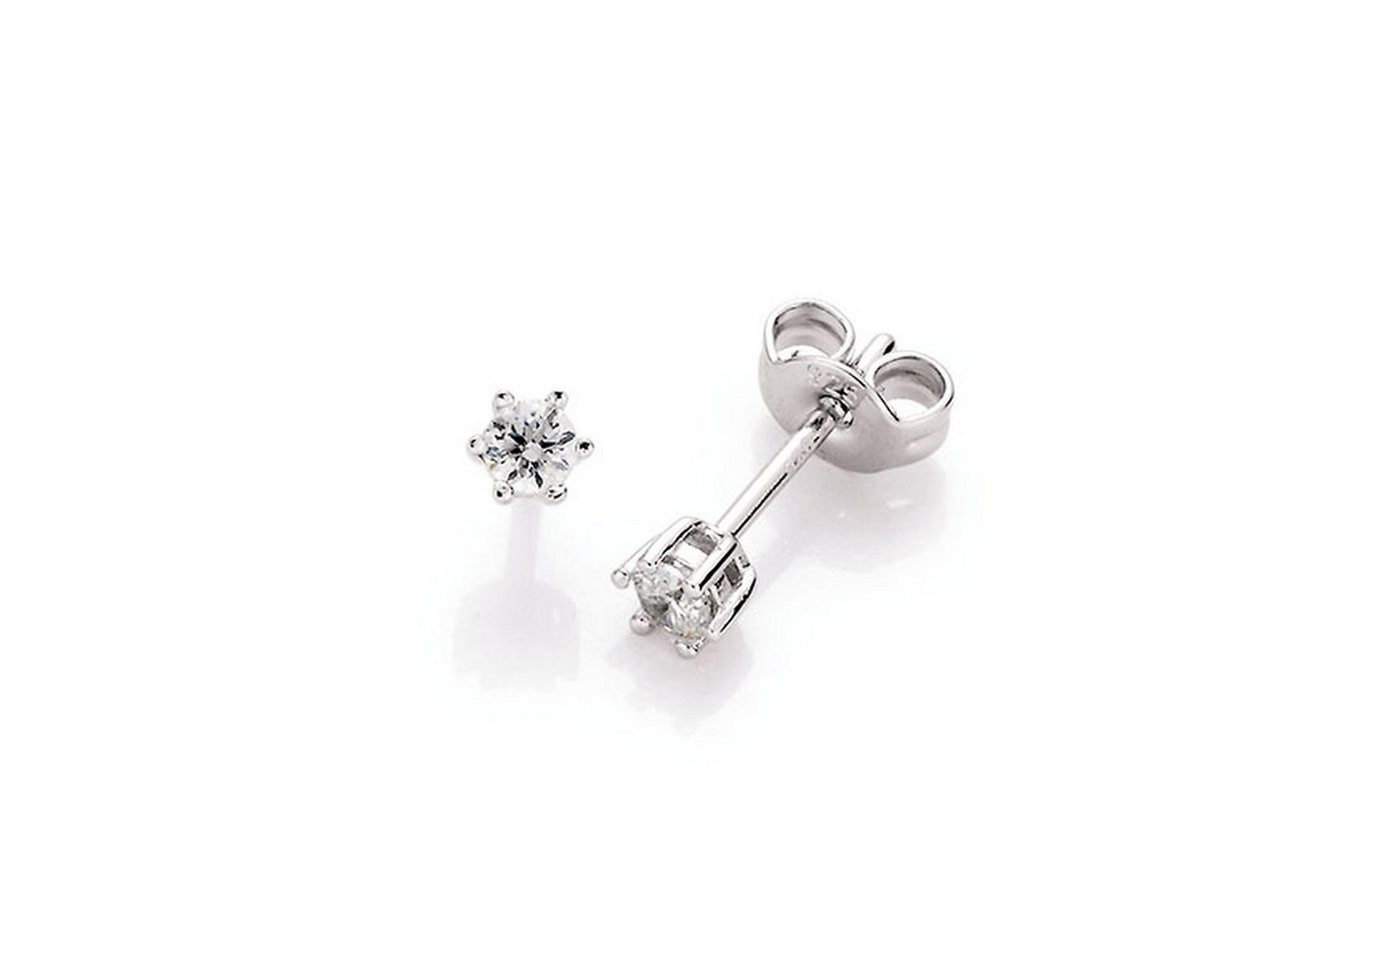 Smart Jewel Paar Ohrstecker »schlicht Krappenfassung«   Schmuck > Ohrschmuck & Ohrringe > Ohrstecker   Smart Jewel